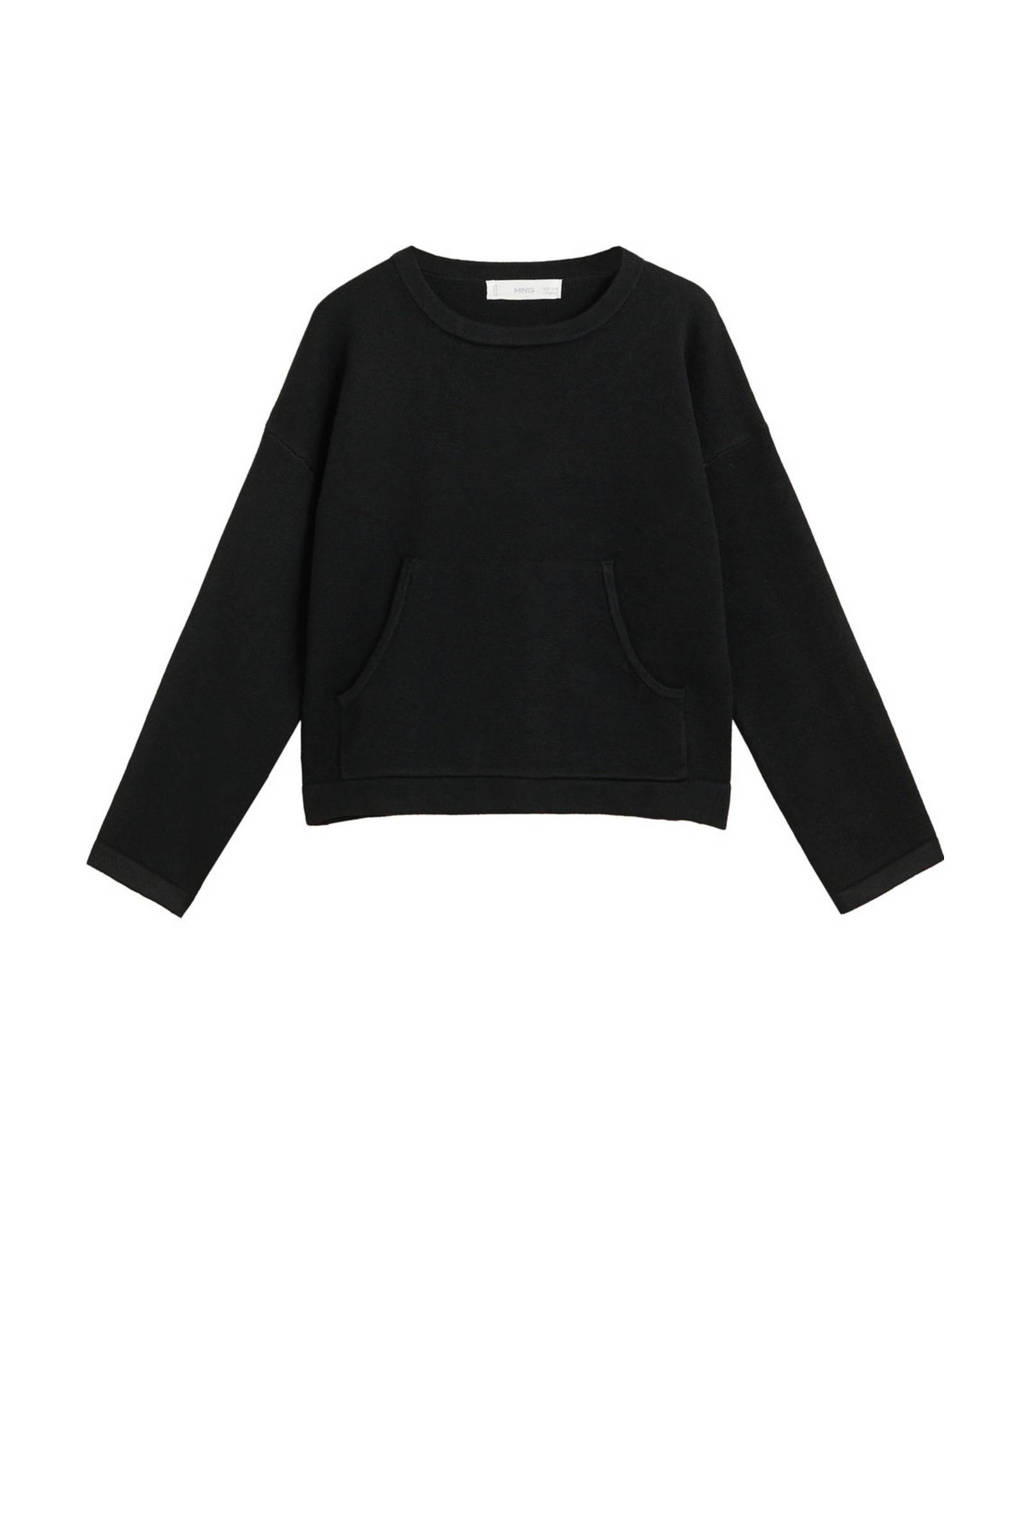 Mango Kids fijngebreide trui zwart, Zwart